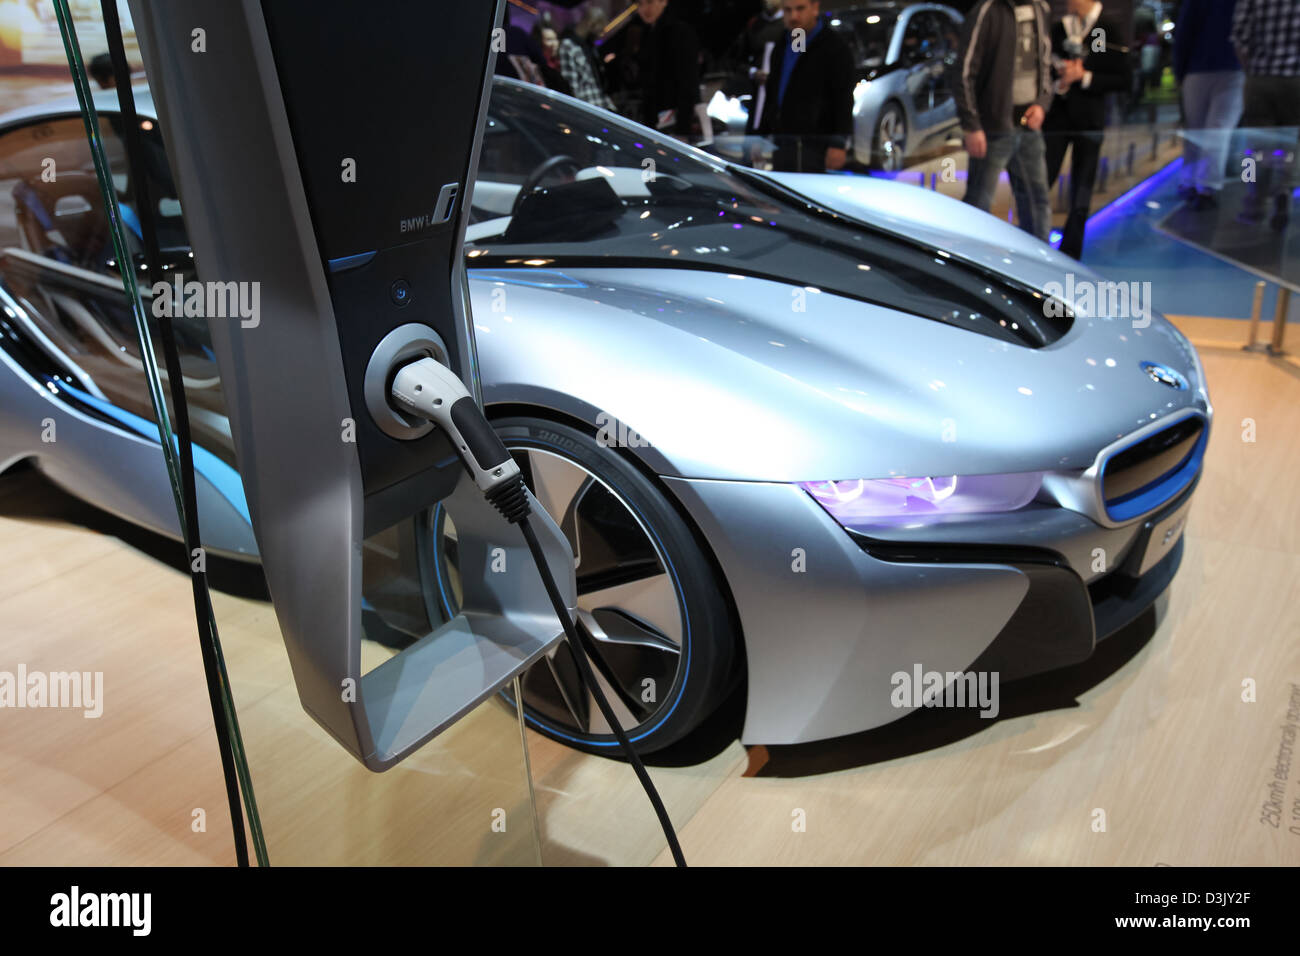 BMW Concept Vision dinamica efficiente Immagini Stock